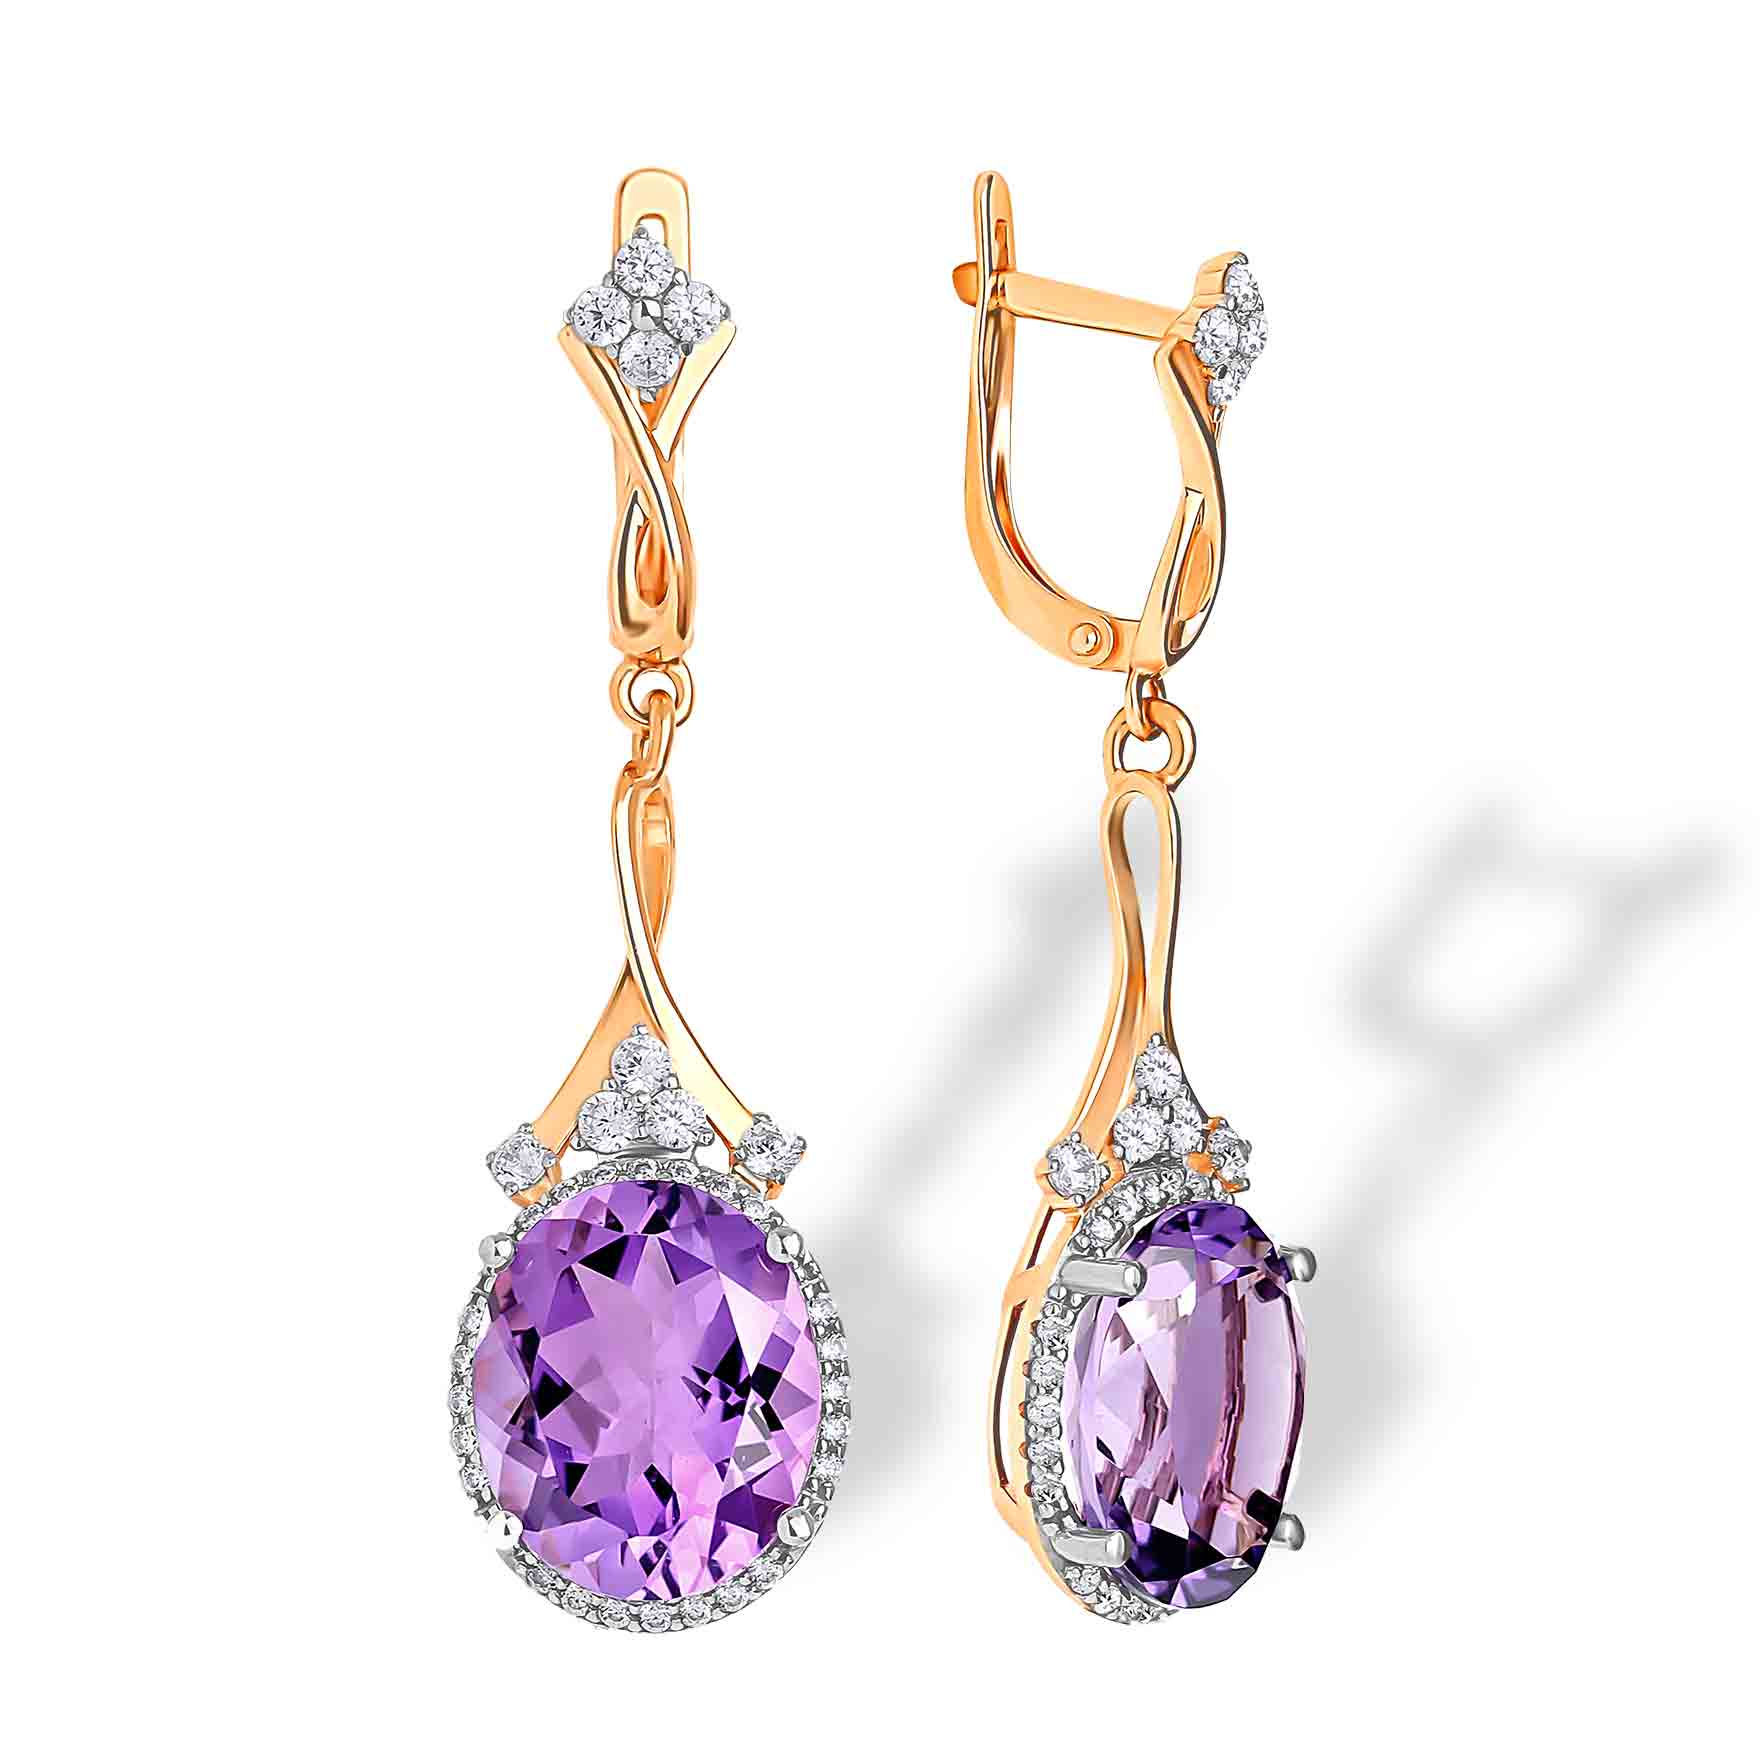 E819 Gorgeous earrings Fine 9CT Gold Amethyst and Diamonds Plum Blossom Stud Earrings